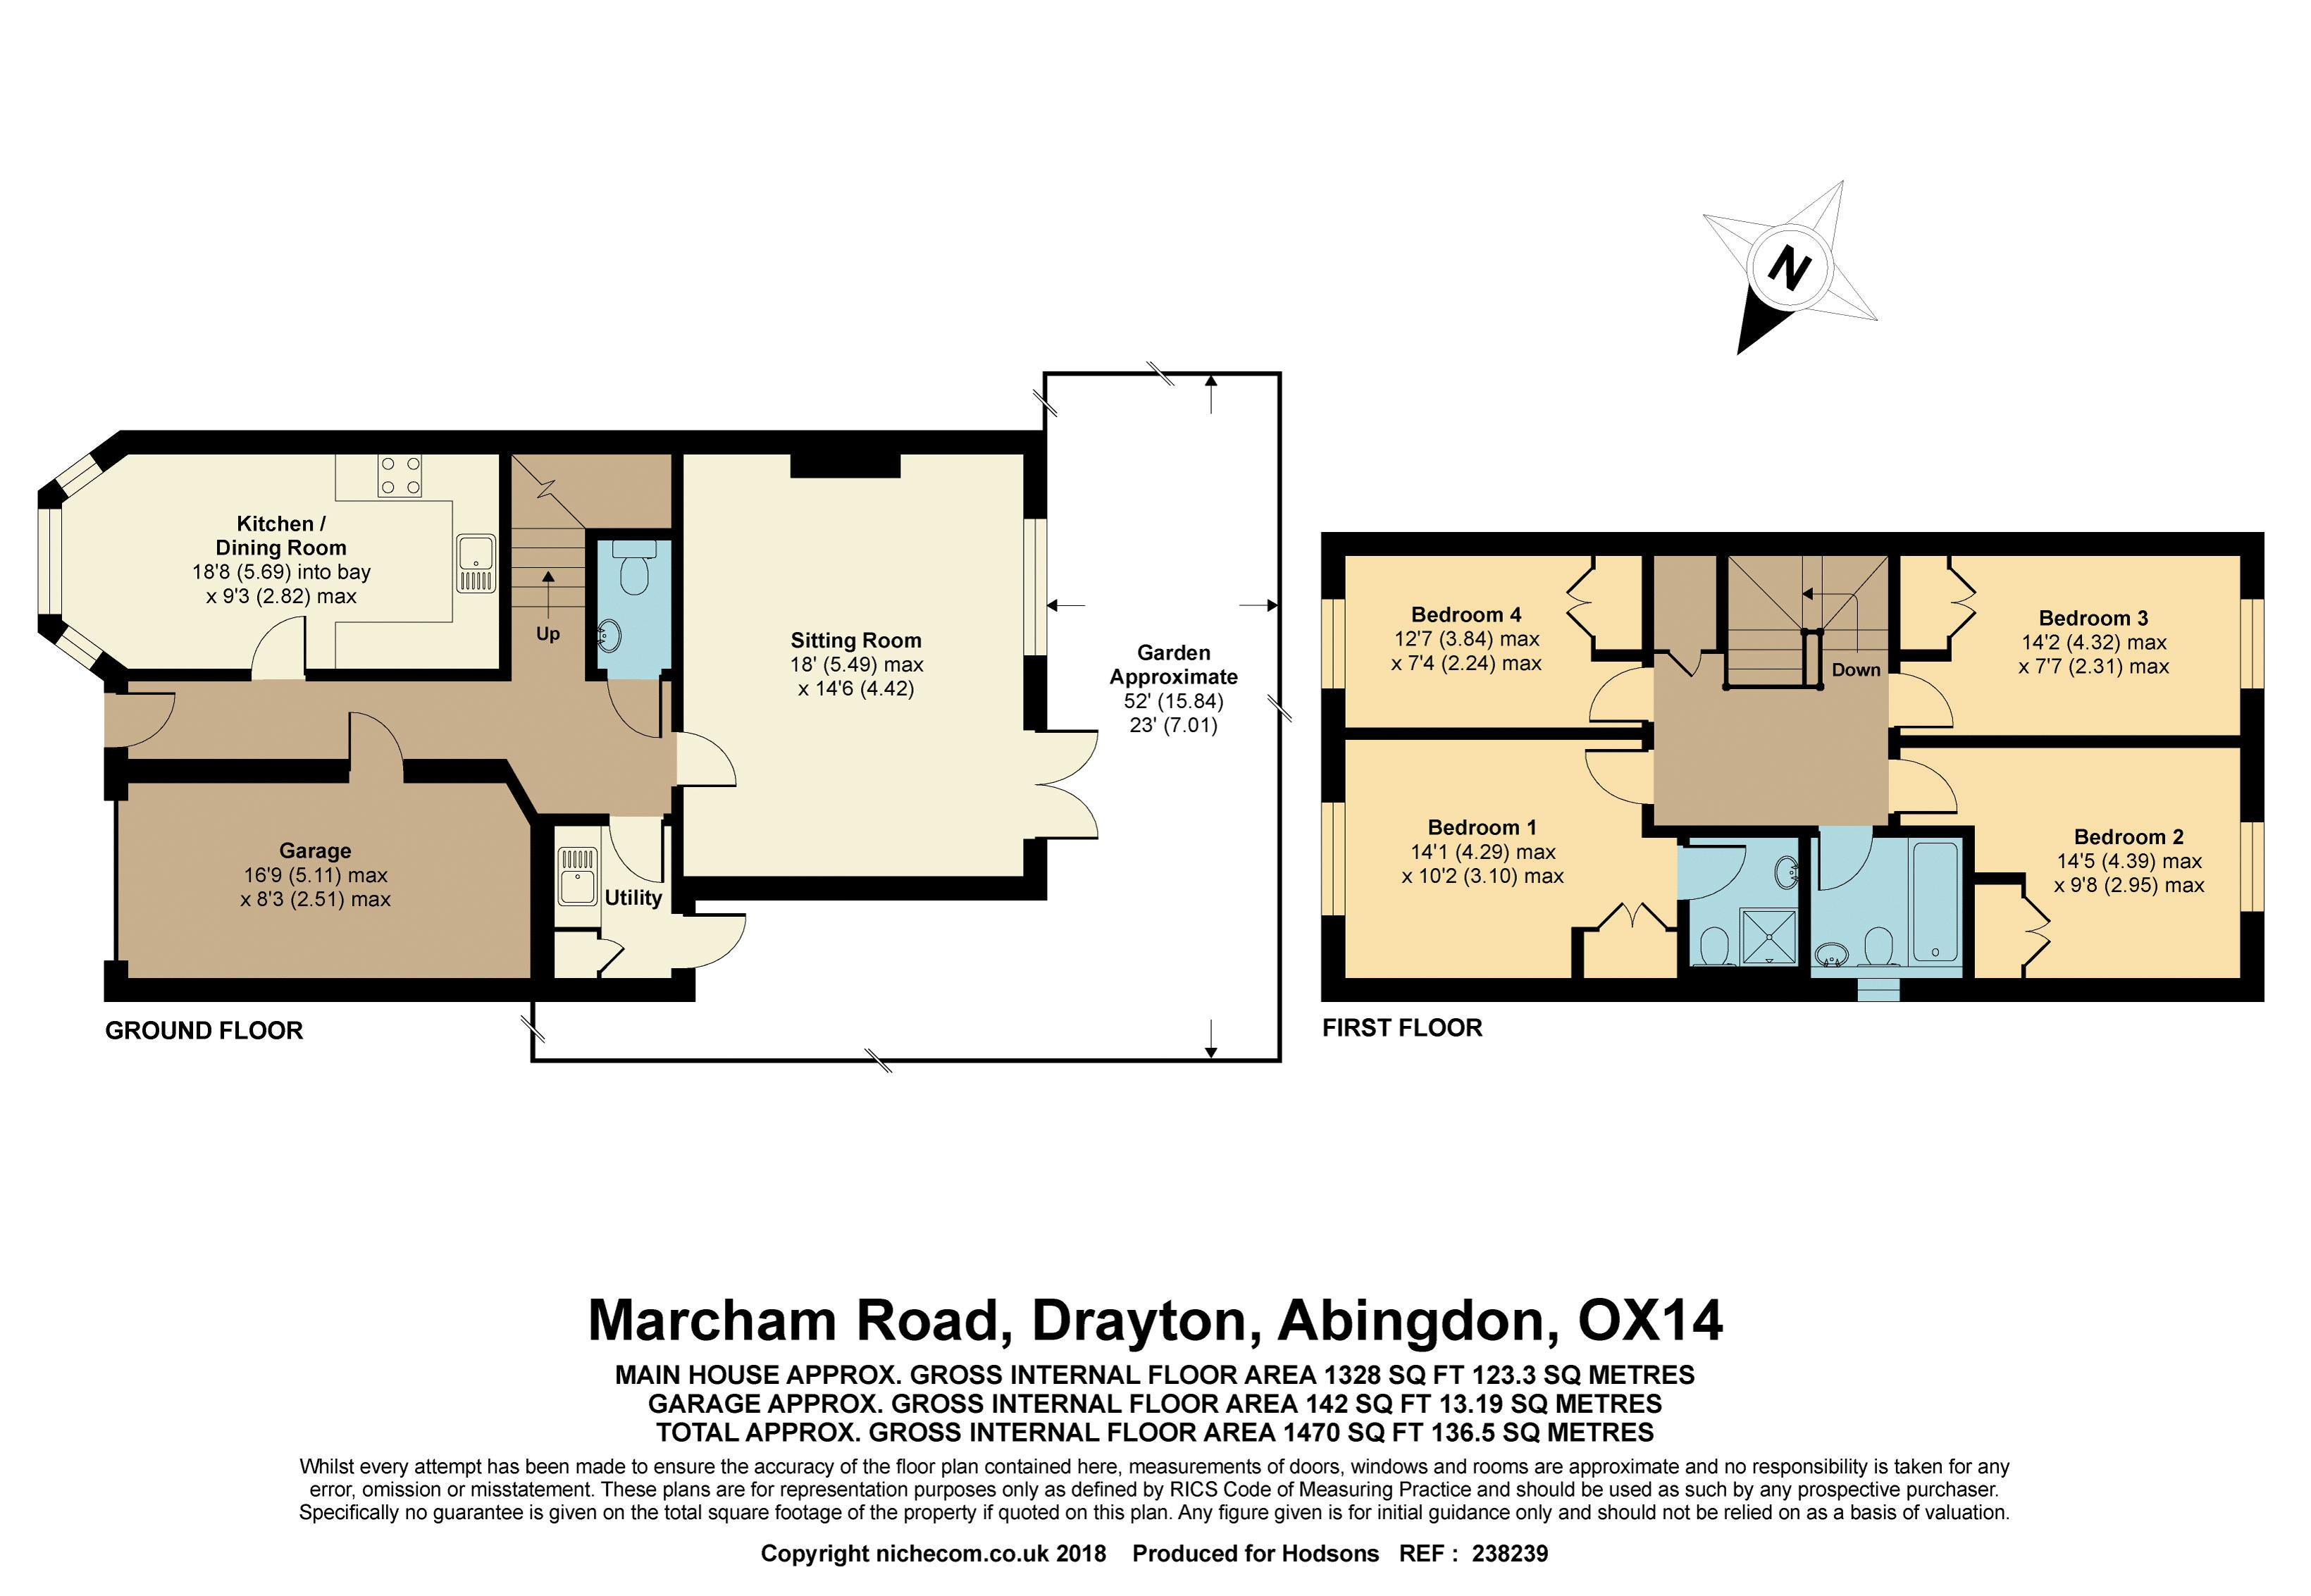 Marcham Road Drayton